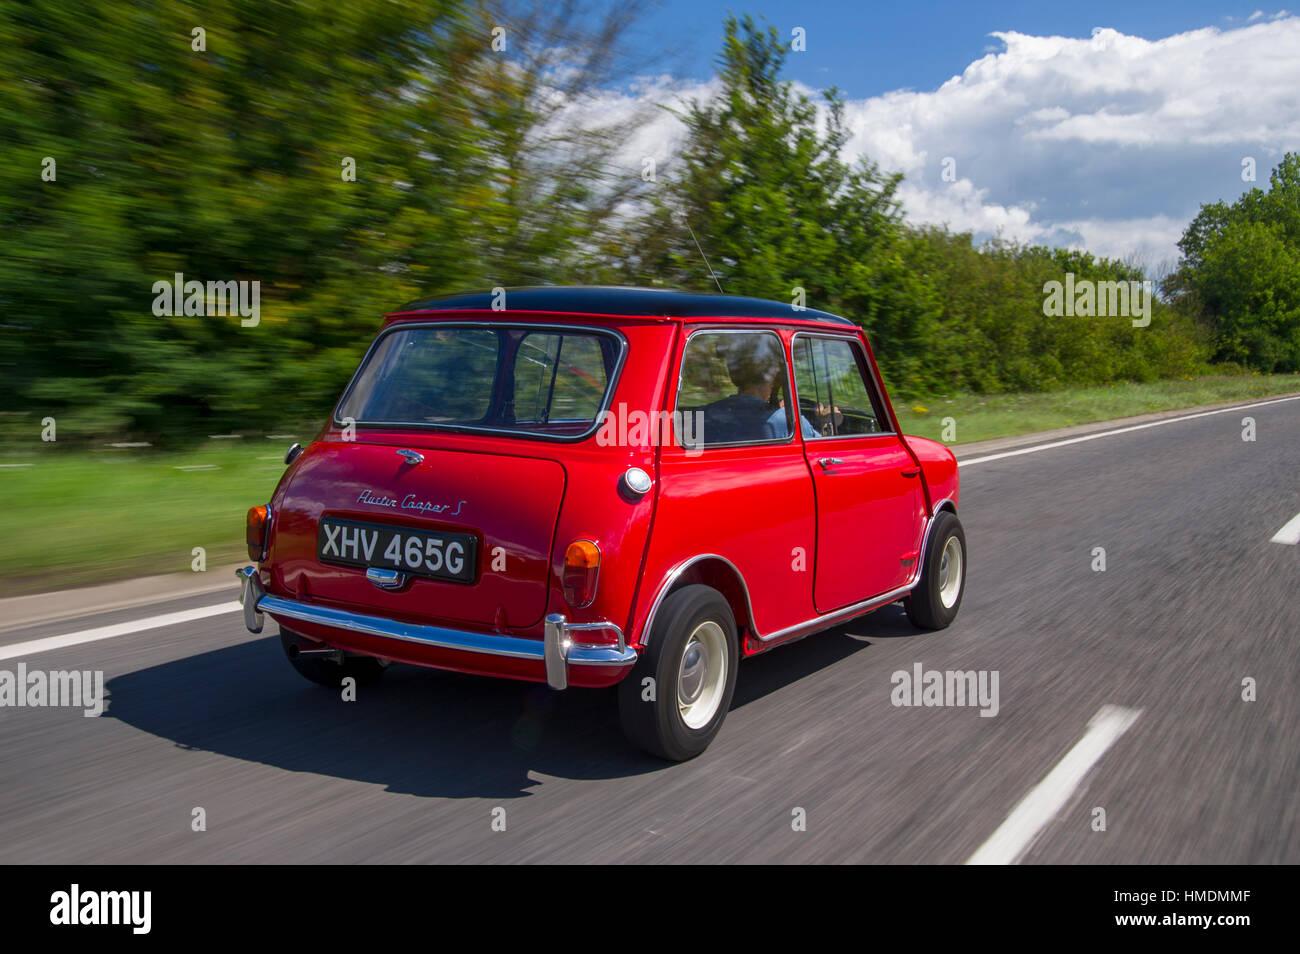 1968 Mini Cooper S classic compact British sports car - Stock Image